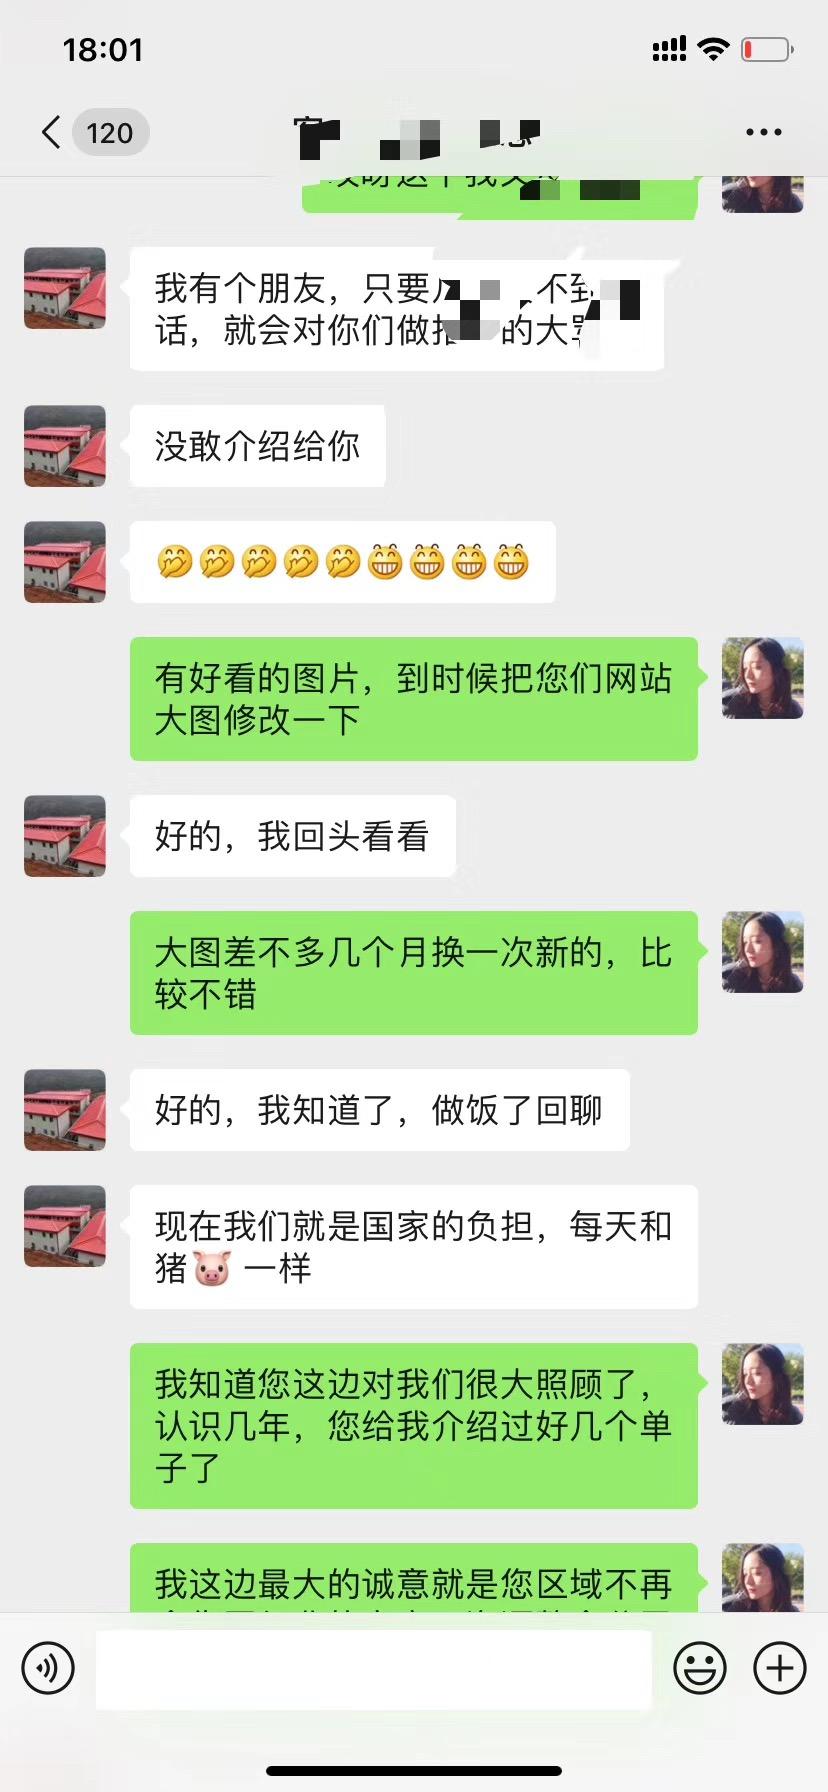 bob亚洲官网网络推广